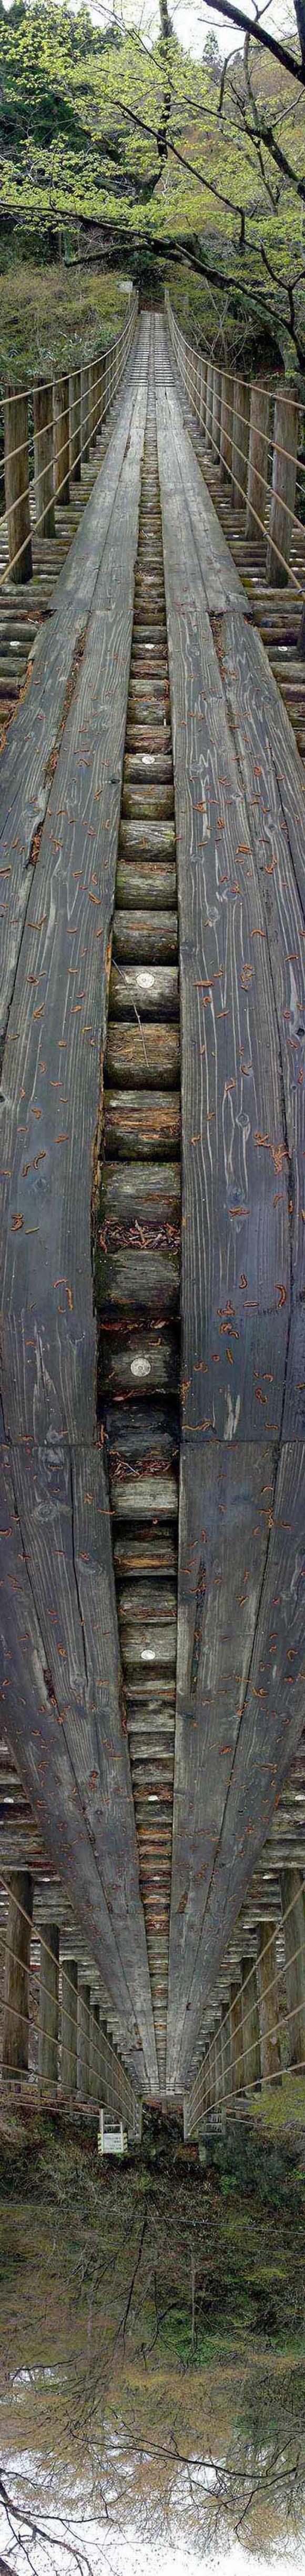 Wooden Bridge Illusion